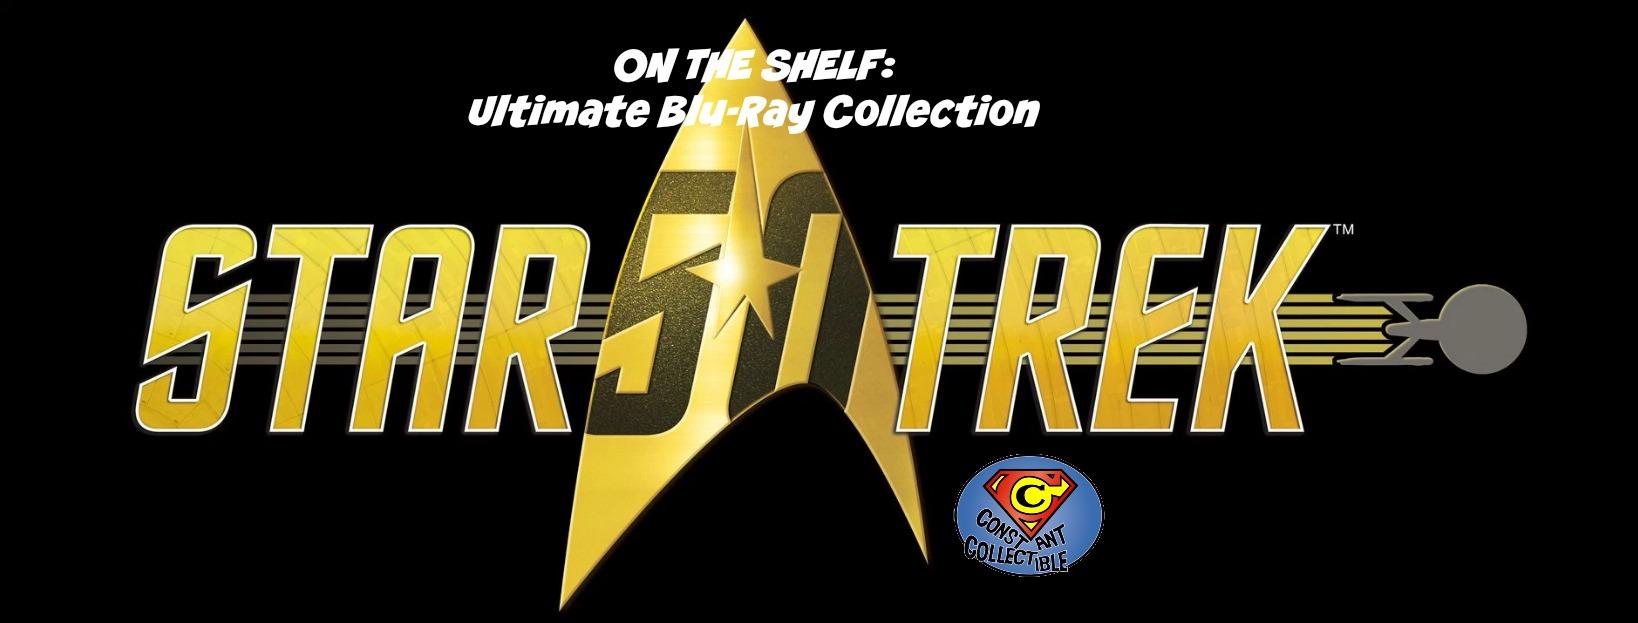 Star Trek BR